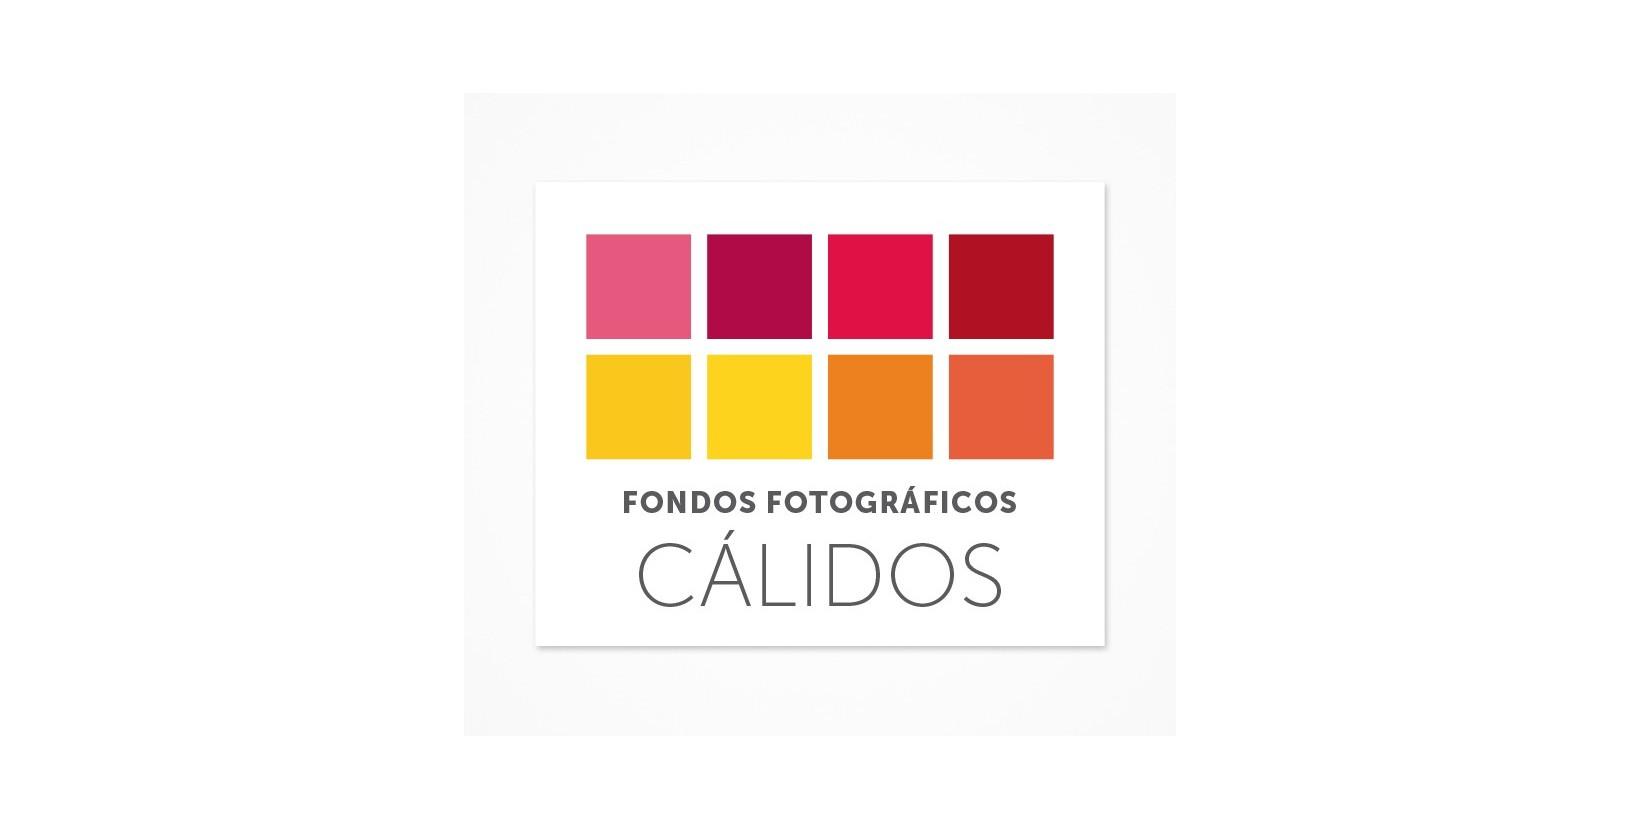 Fondos fotogr ficos colores c lidos - Imagenes de colores calidos ...